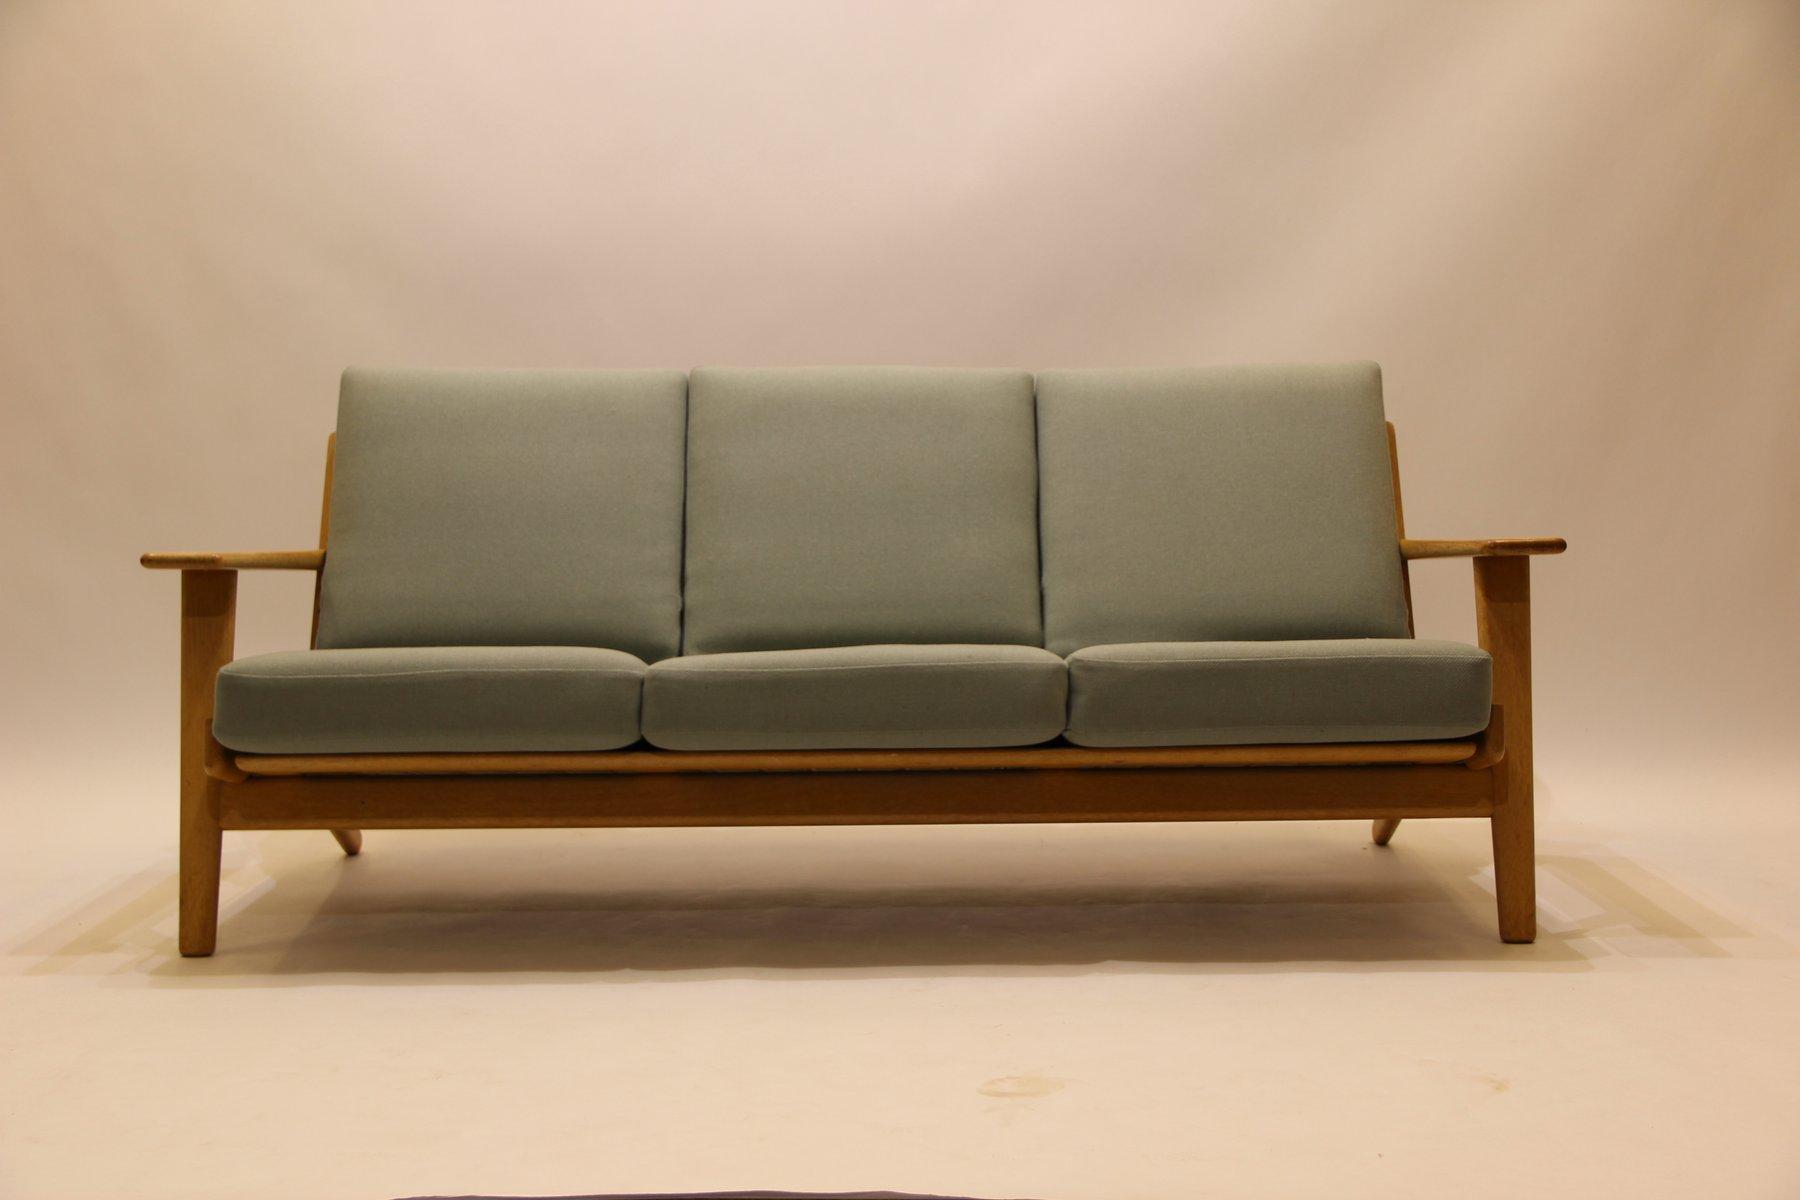 3 sitzer schlafsofa 3 sitzer schlafsofa with 3 sitzer schlafsofa tubby sitzer sofa retrogelb. Black Bedroom Furniture Sets. Home Design Ideas